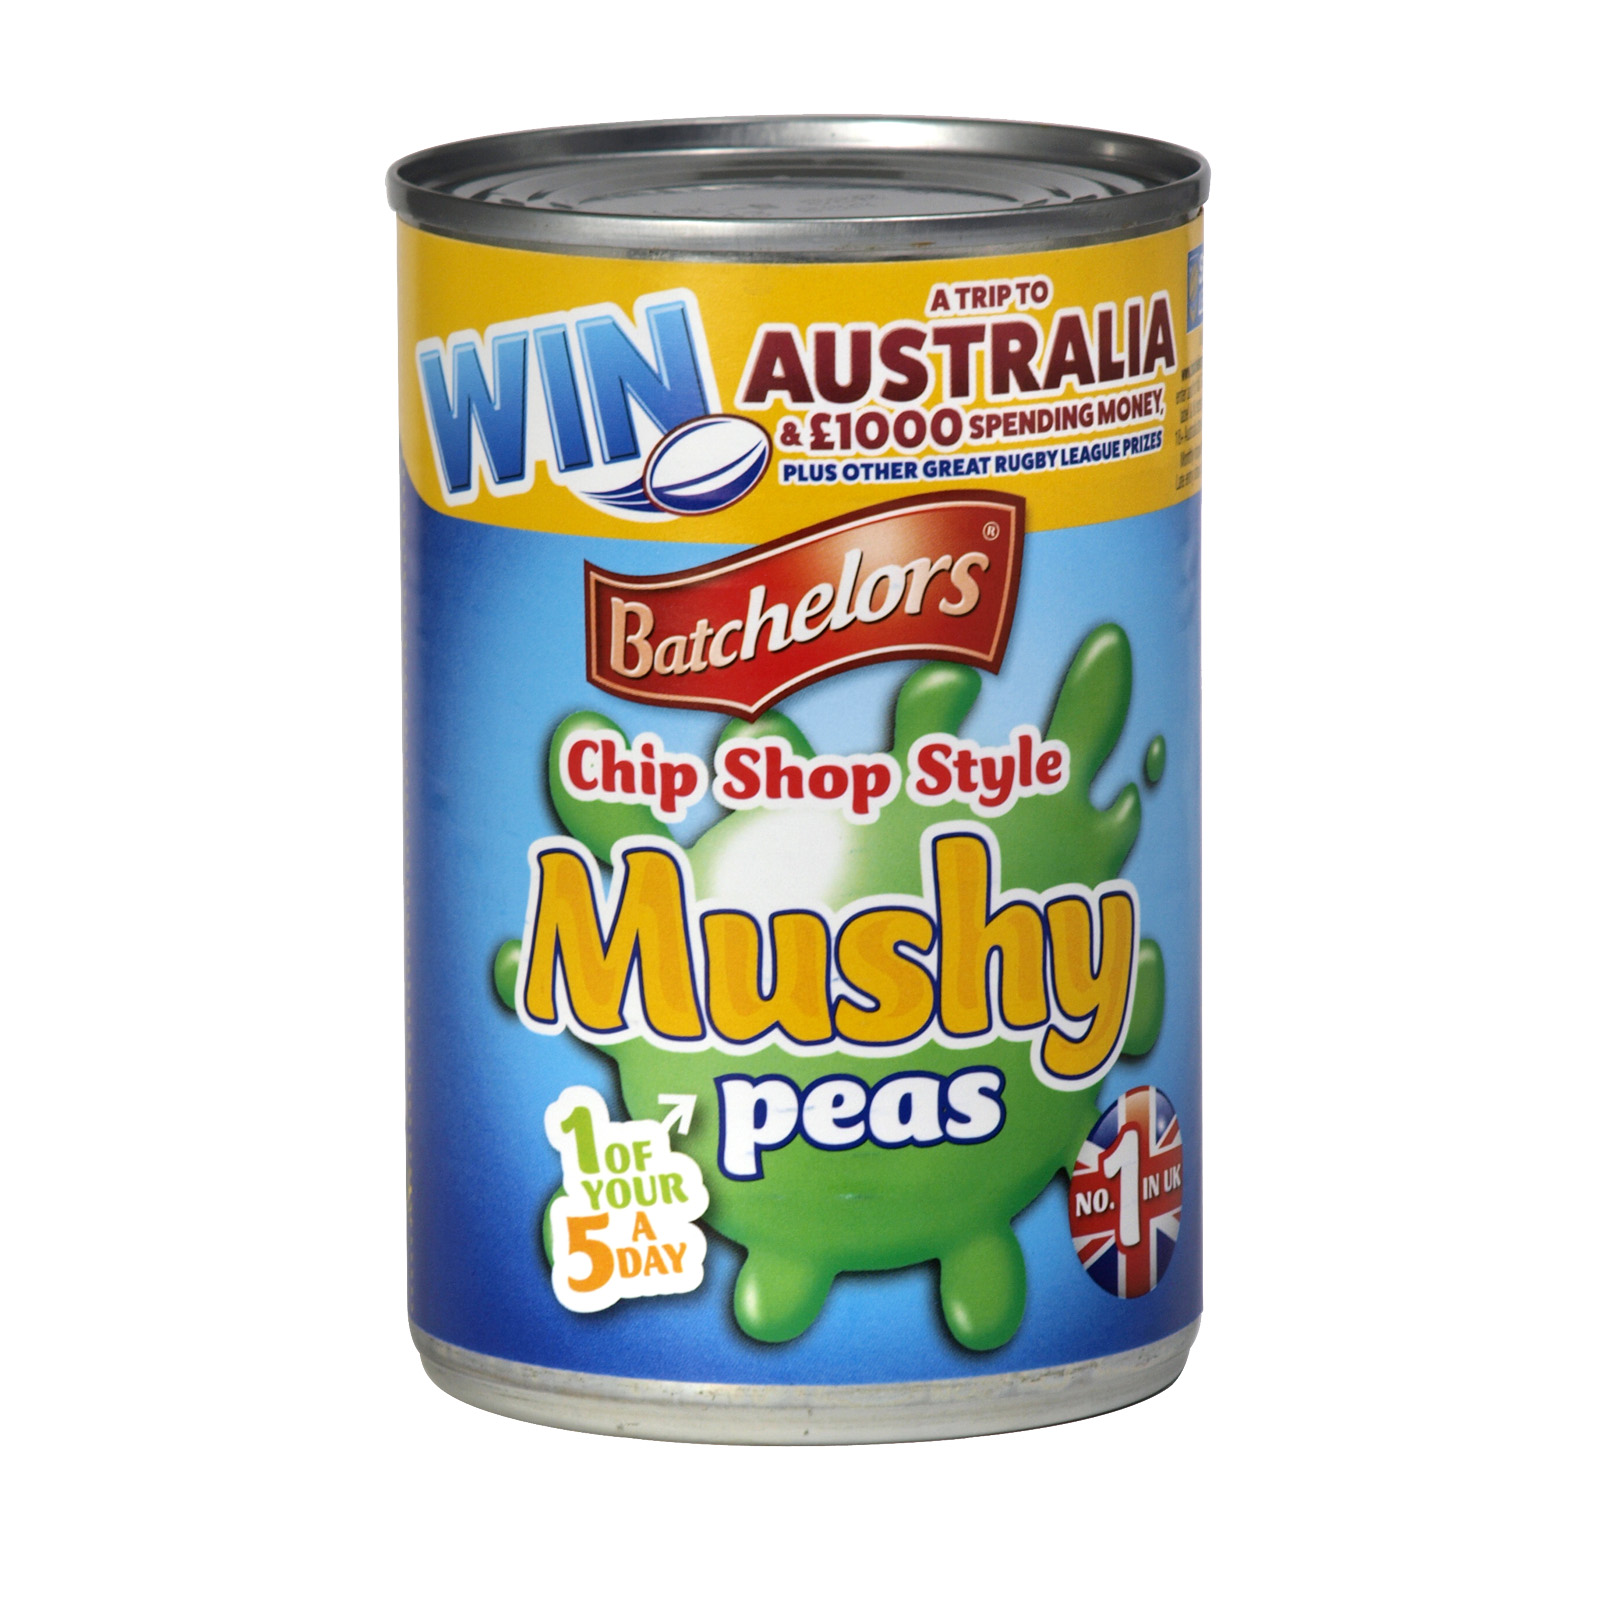 BATCHELORS MUSHY PEAS CHIP SHOP 300G